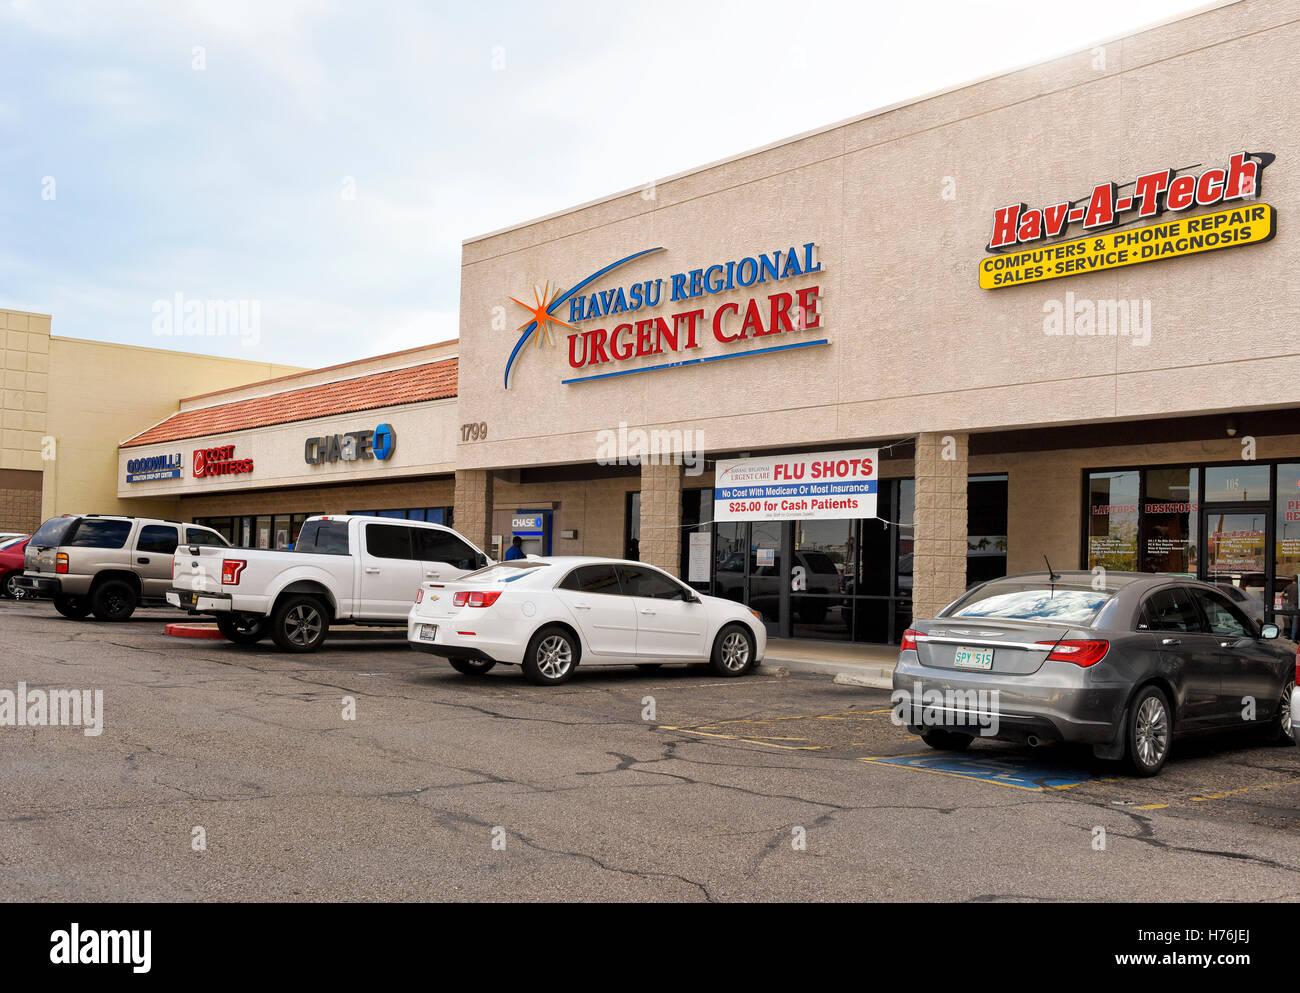 Urgent Care in a strip mall, Lake Havasu City, Arizona - Stock Image